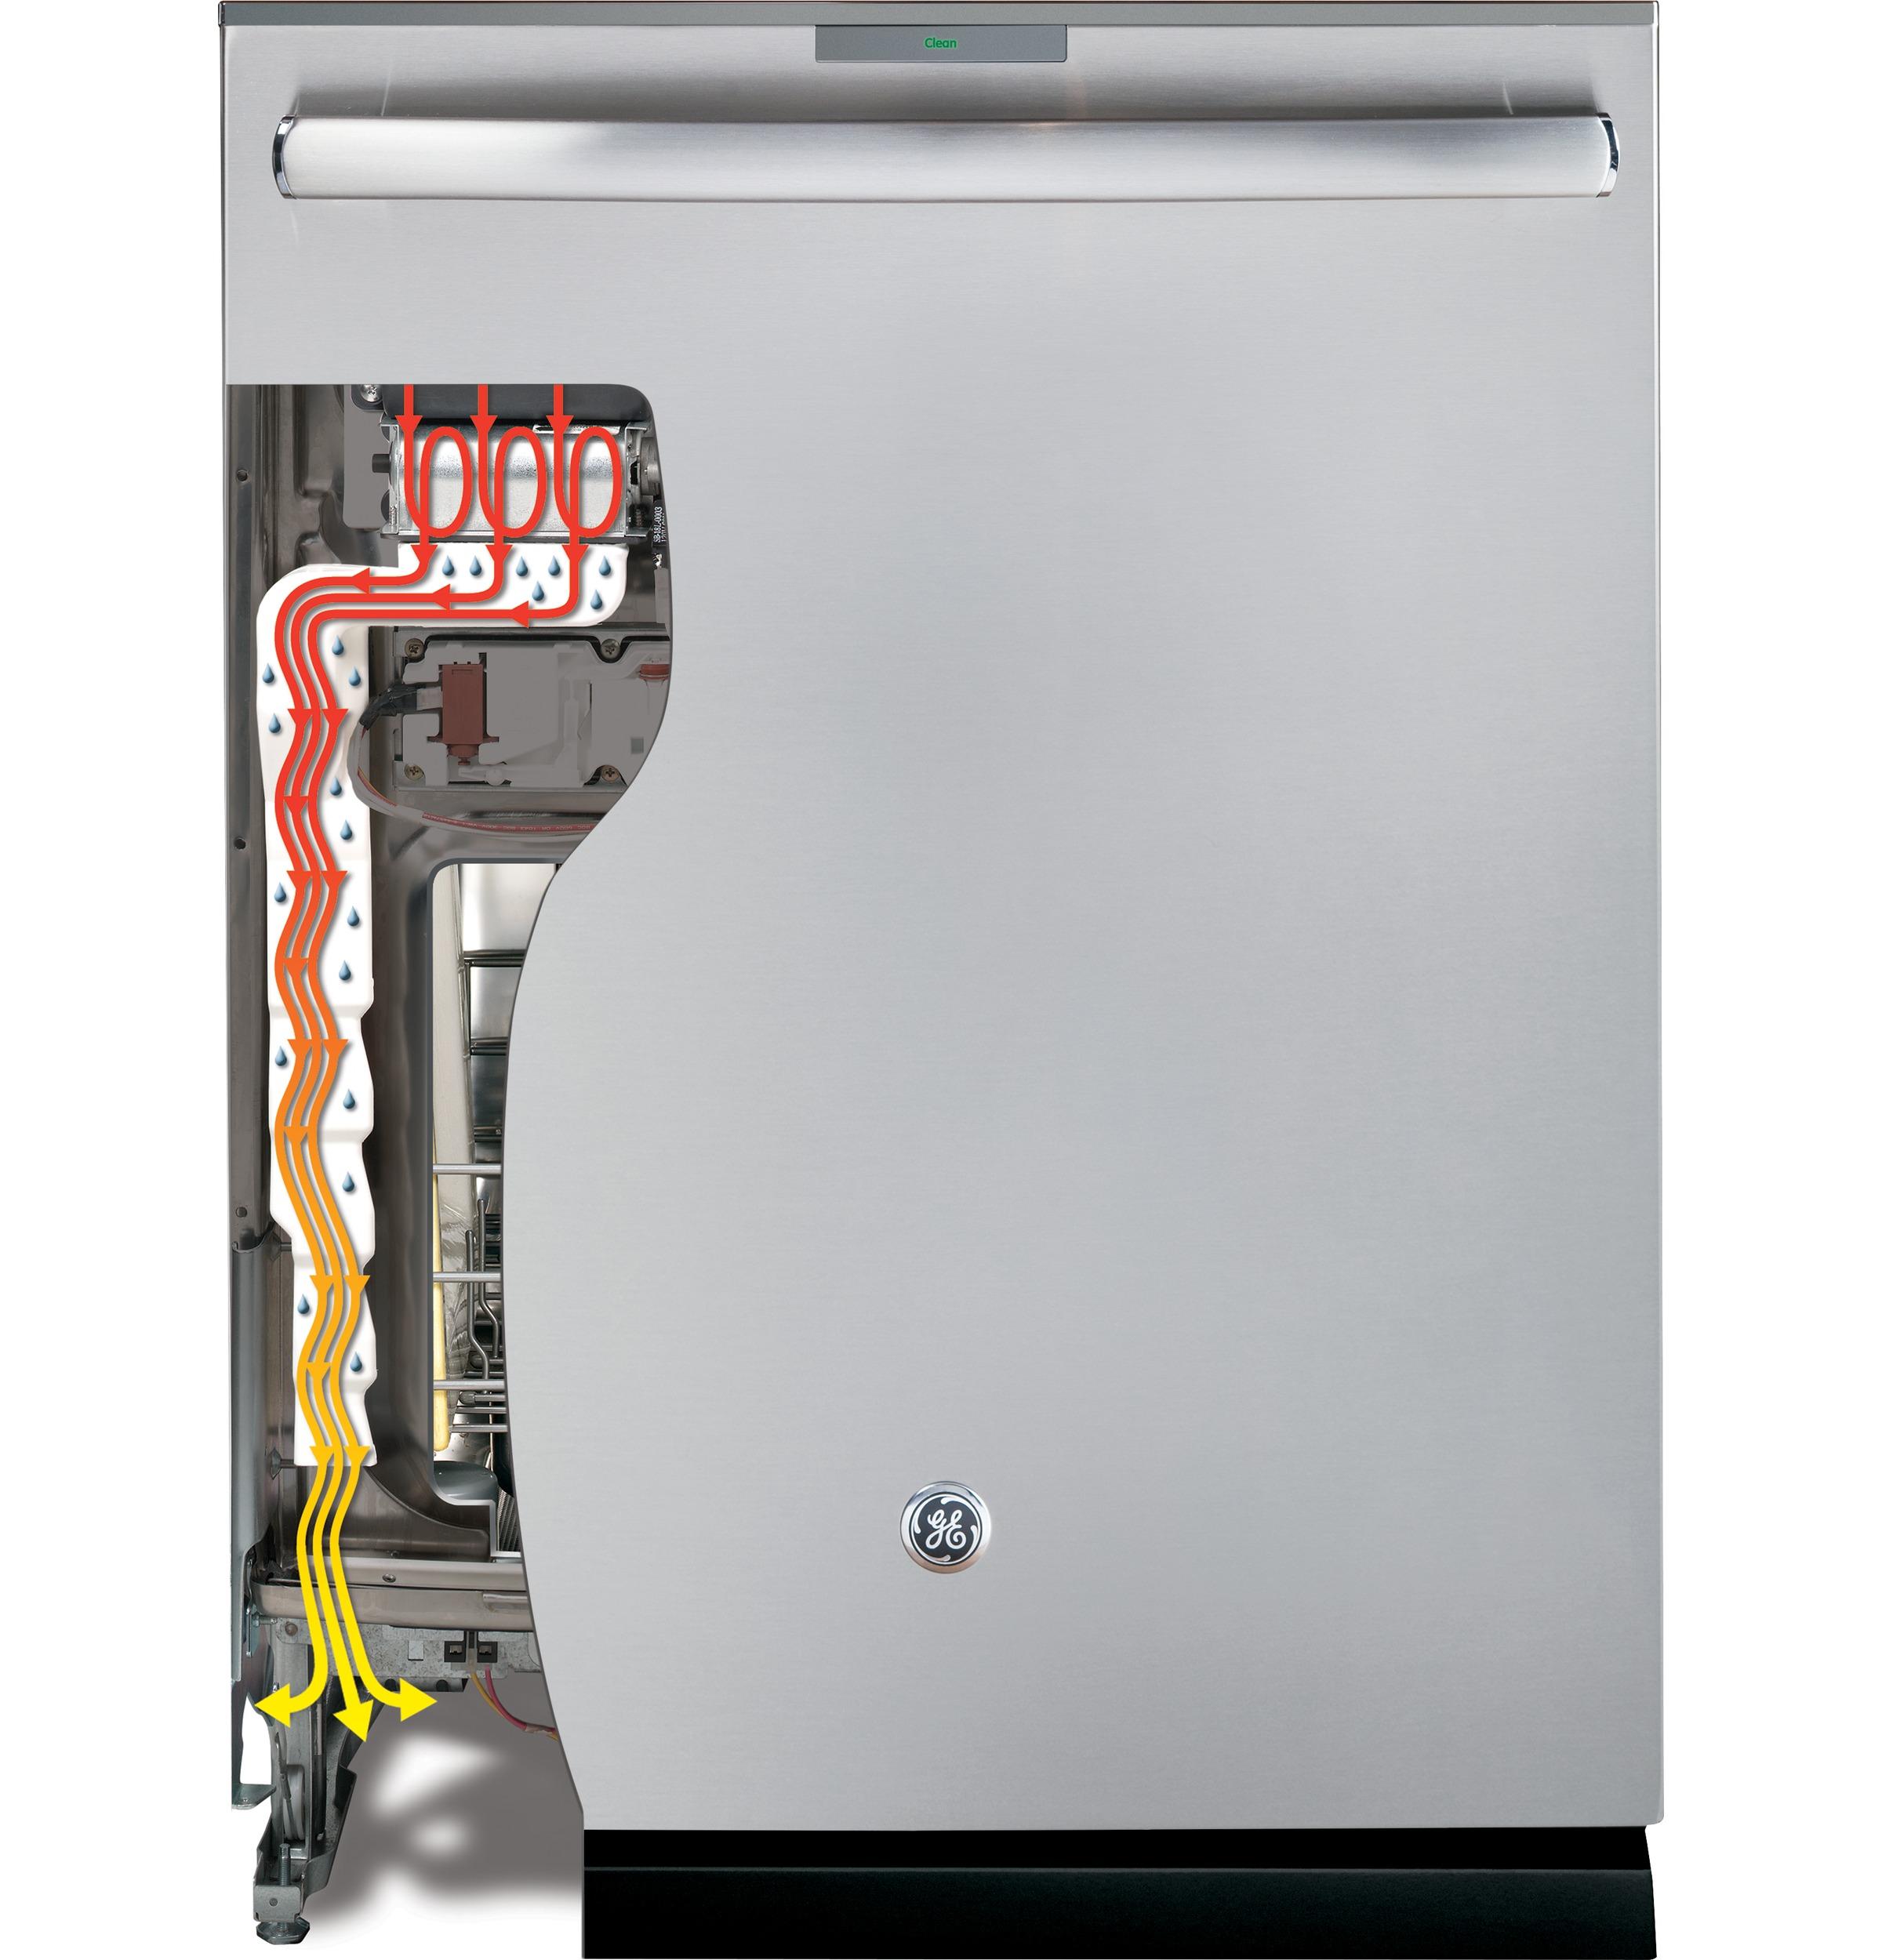 Model: PDT825SGJBB | GE Profile™ Stainless Steel Interior Dishwasher with Hidden Controls